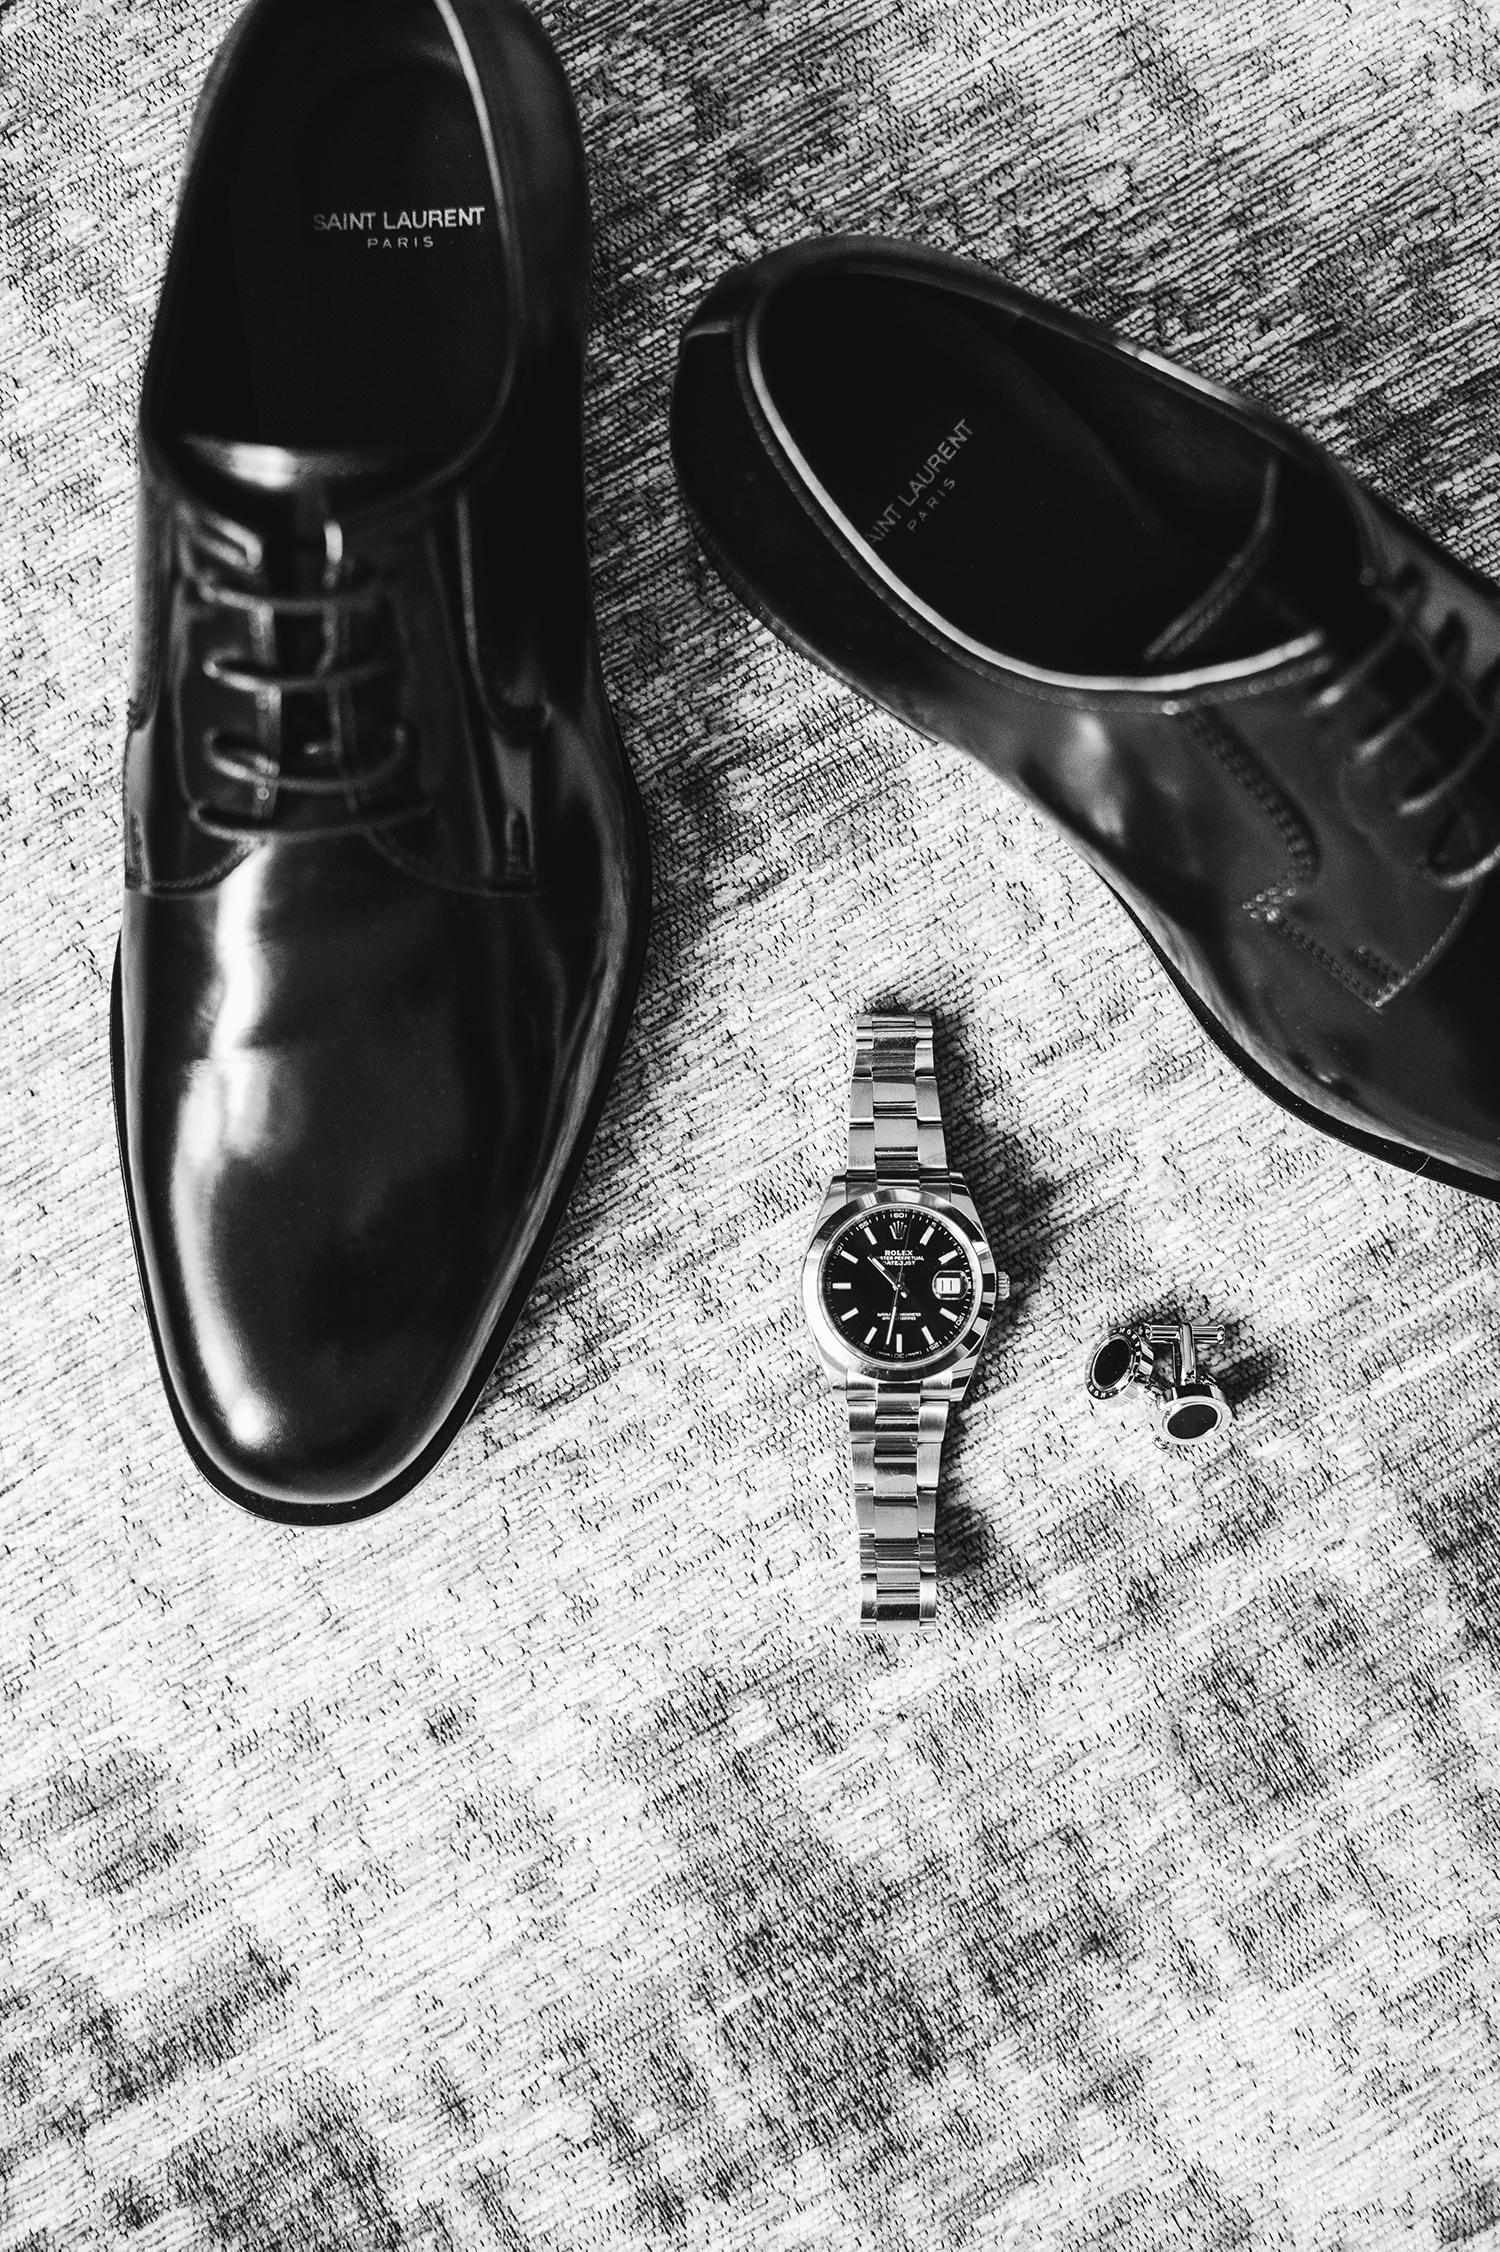 picture: desirePhotography, Wedding Details Groom